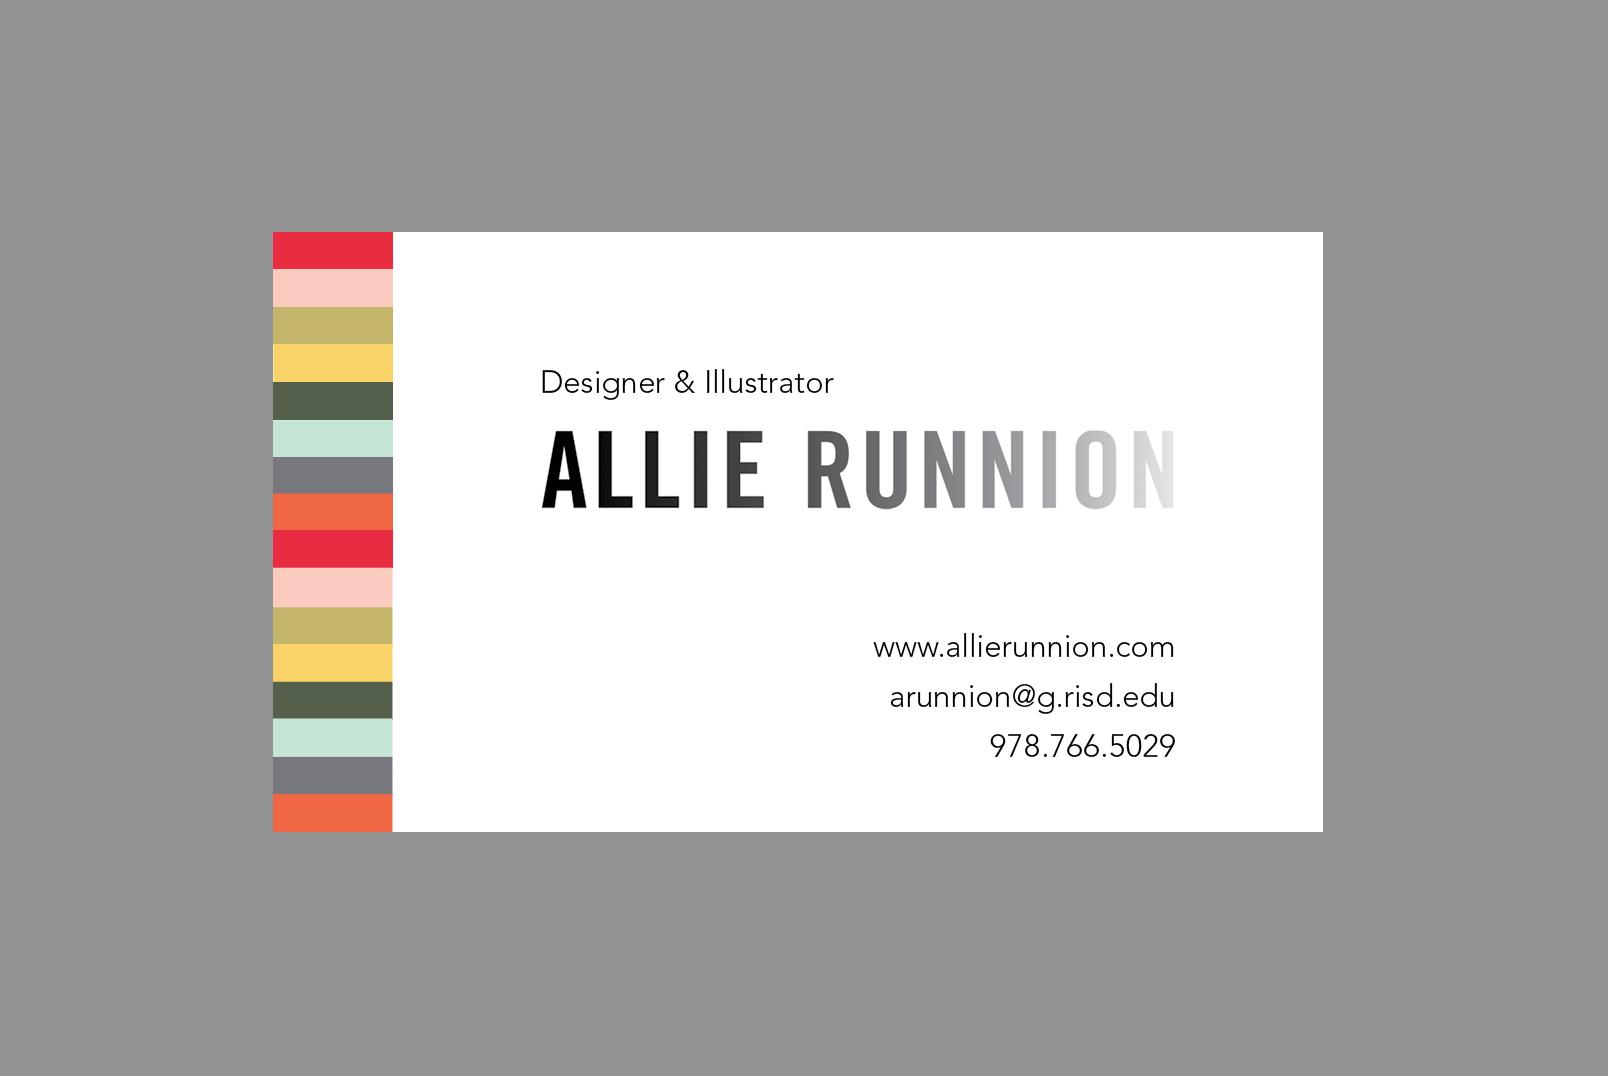 Allie Runnion Design & Illustration - image 1 - student project